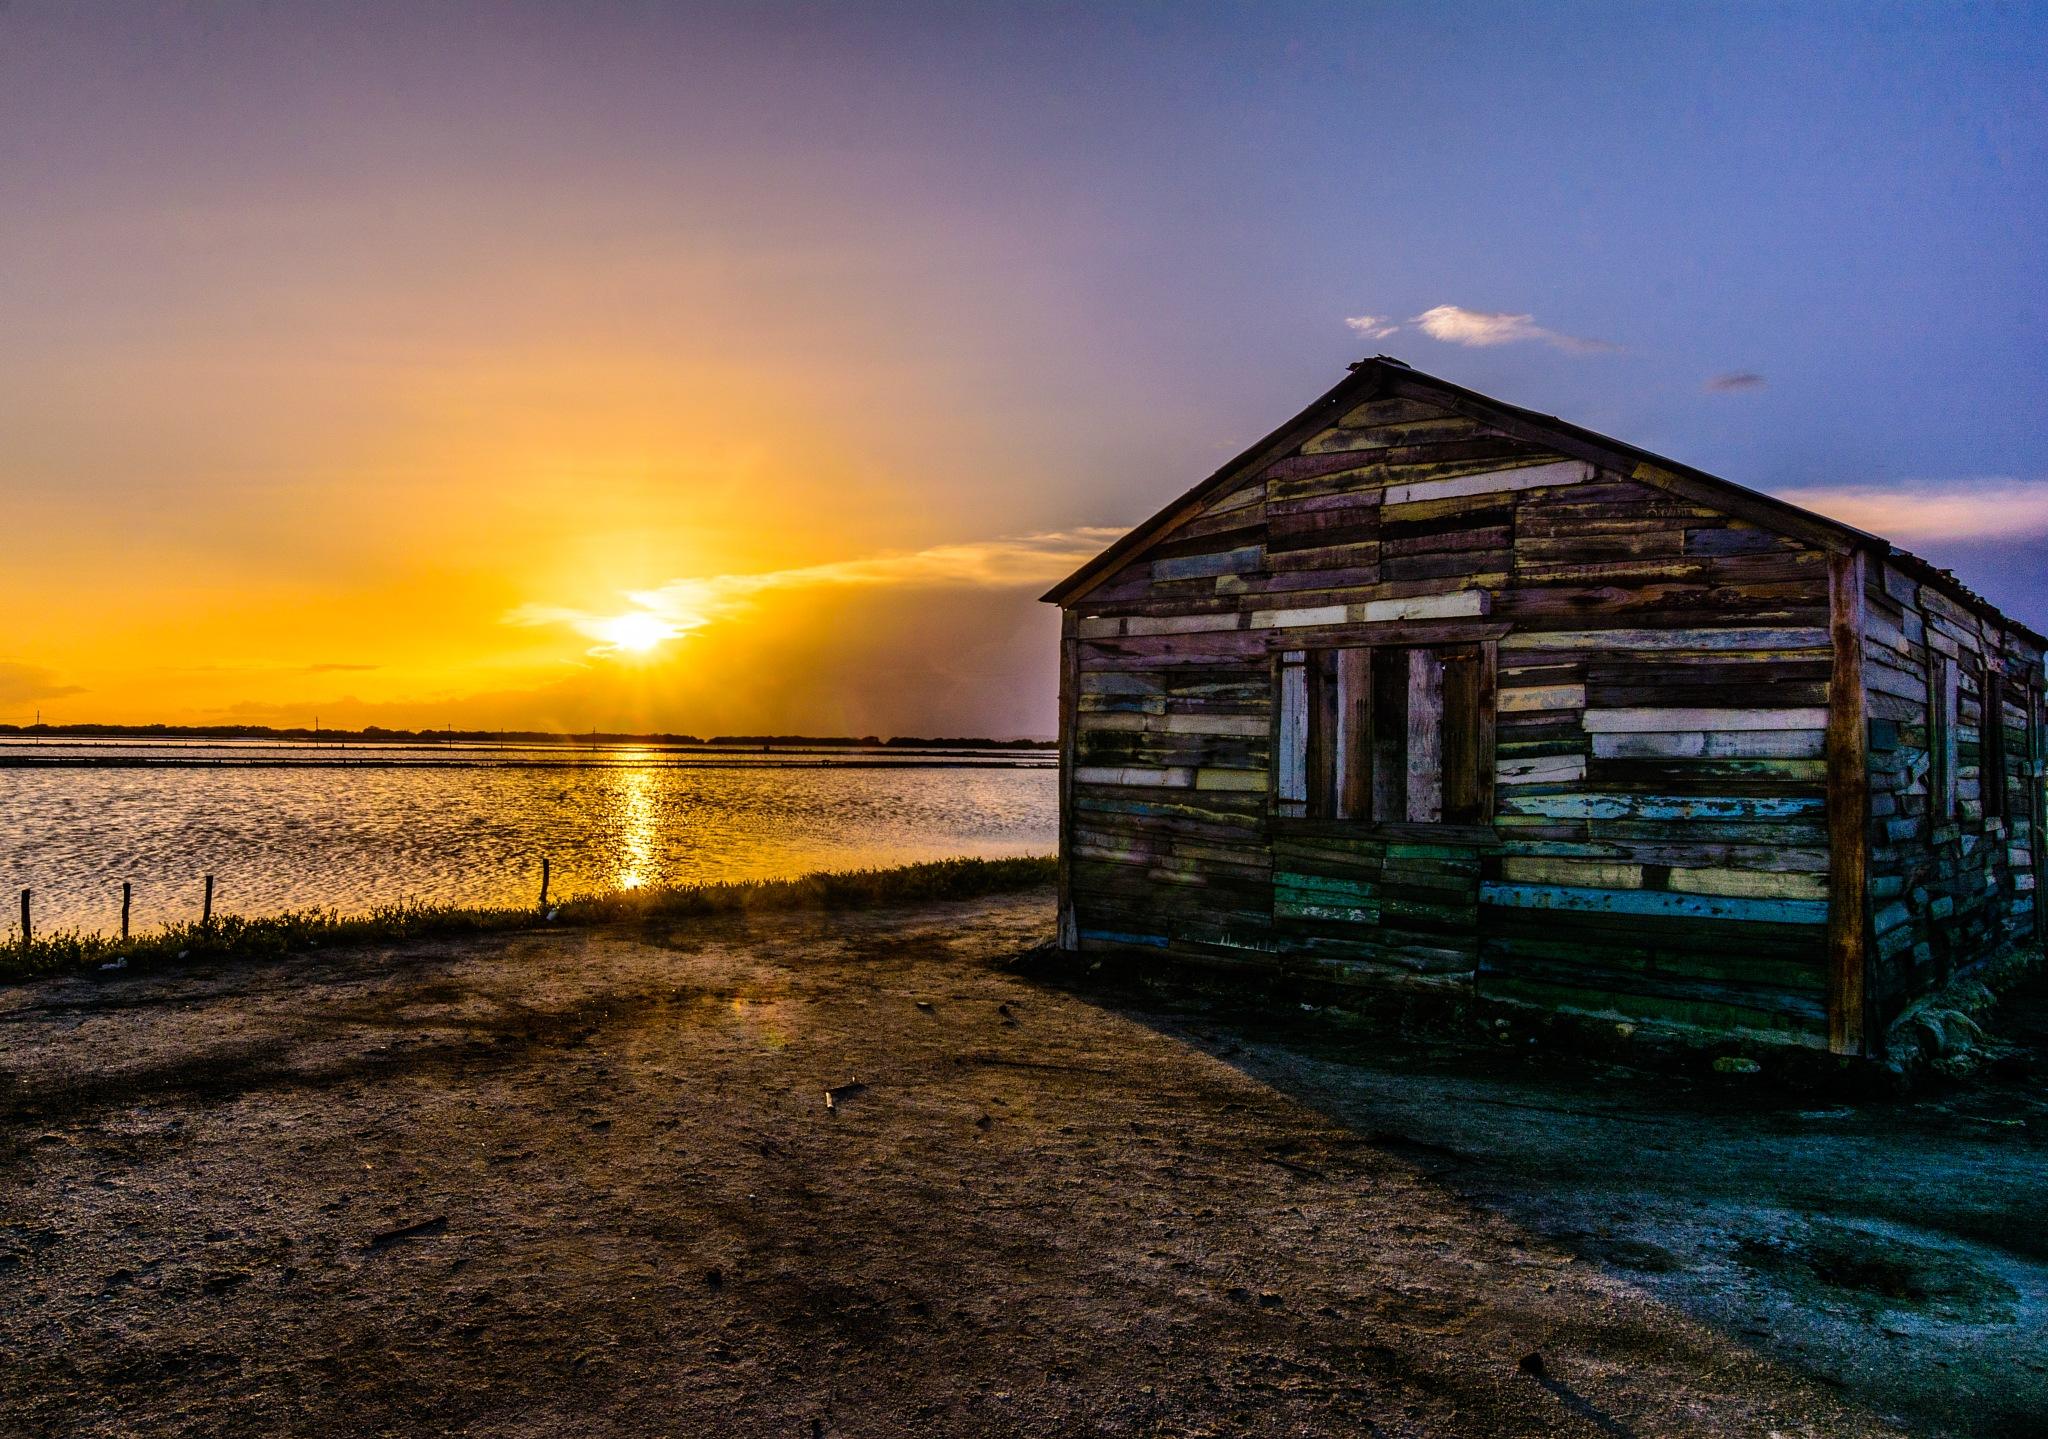 Island sunset by Edwin Concepción